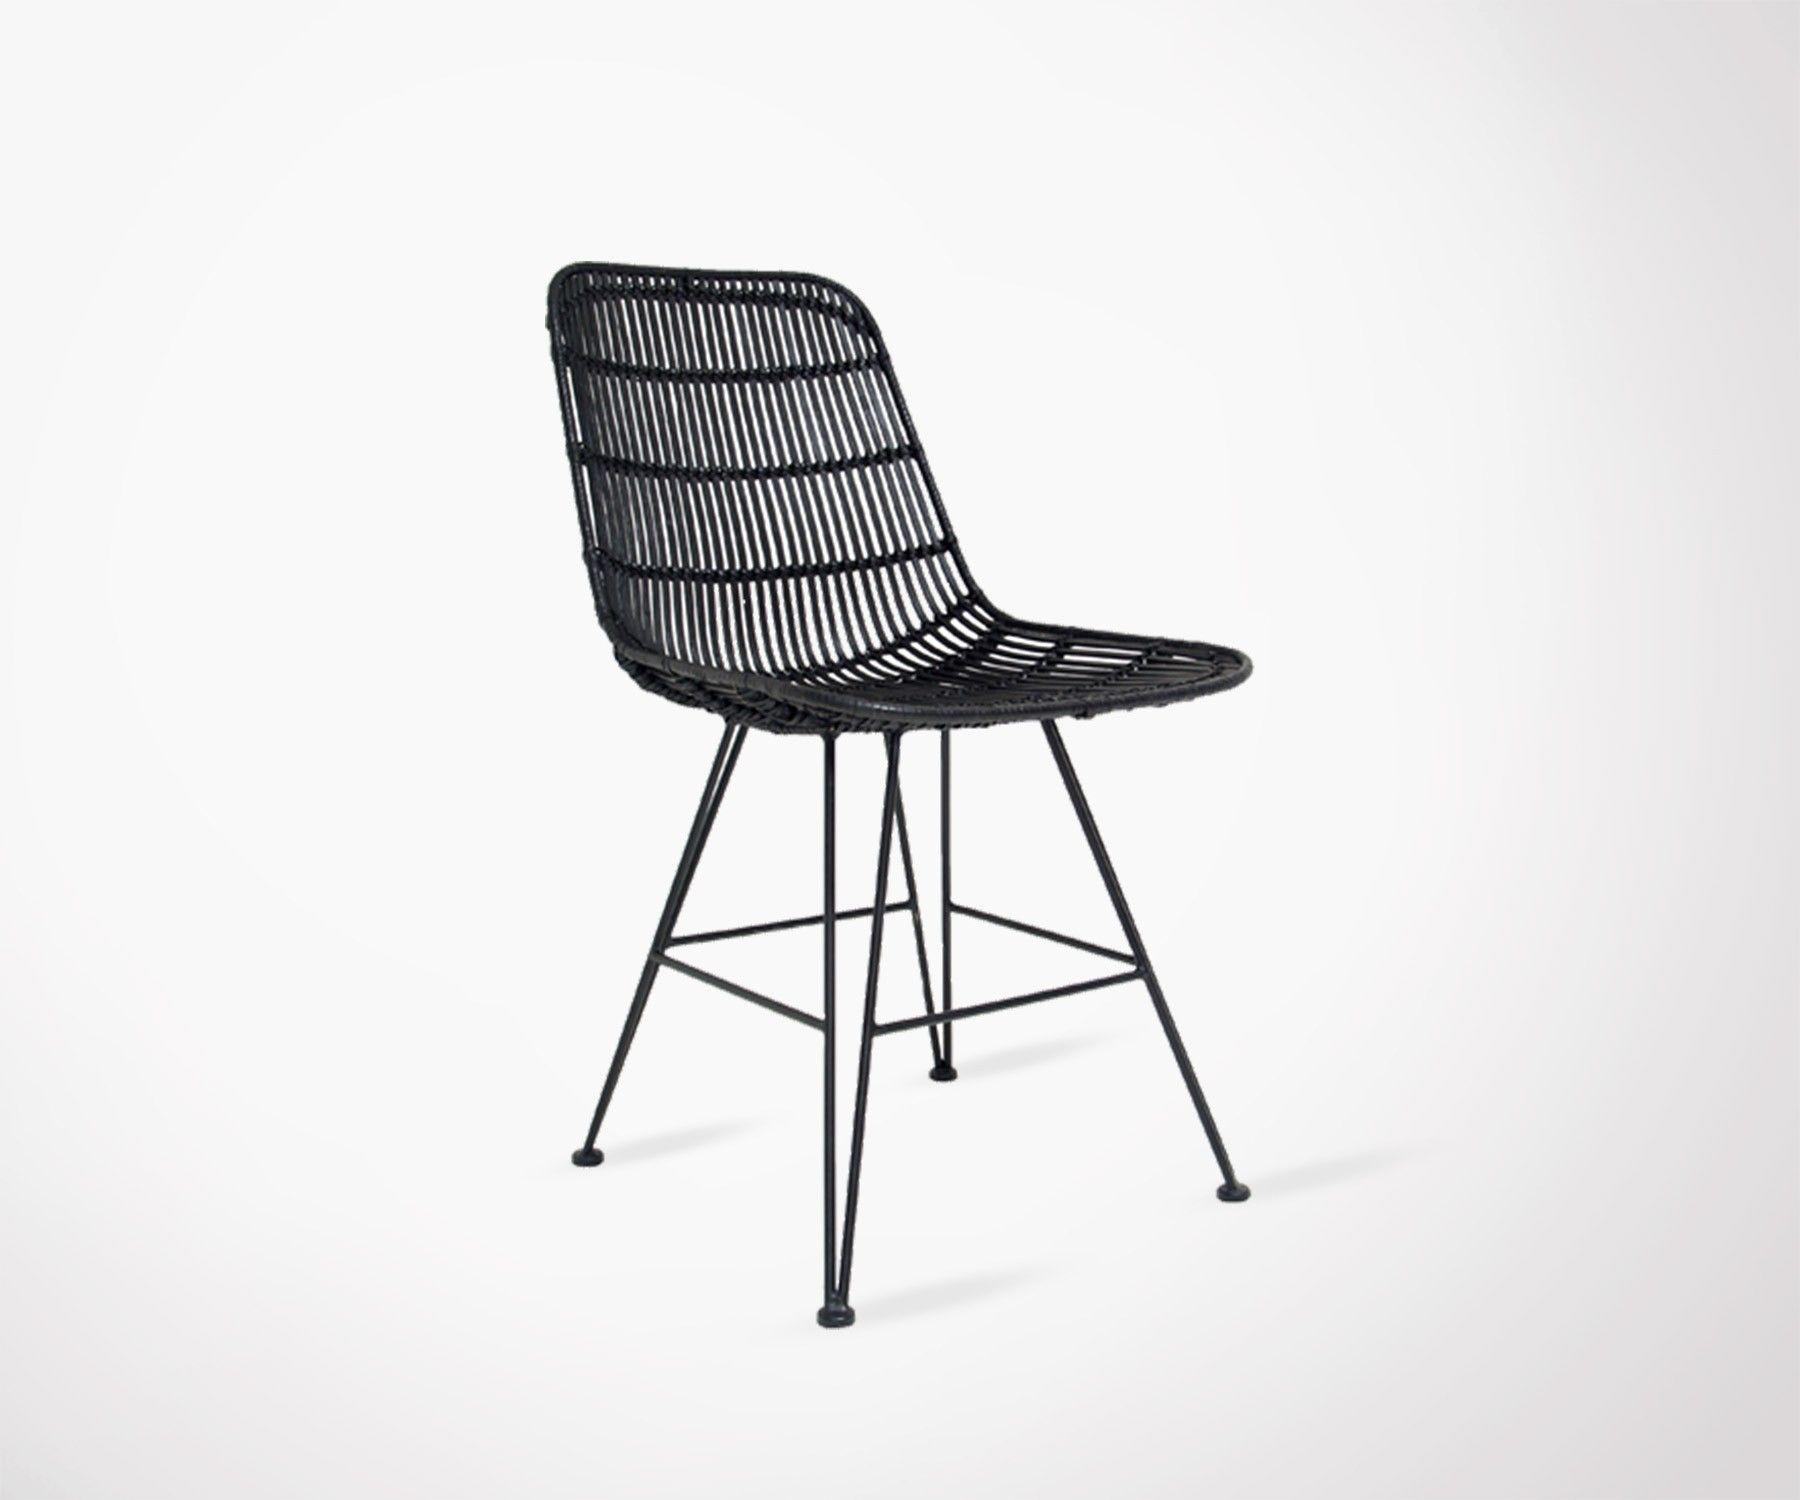 Chaise Design Rotin Noir Pieds Metal Noir Rattan Hk Living Chaise Rotin Chaise Design Chaise